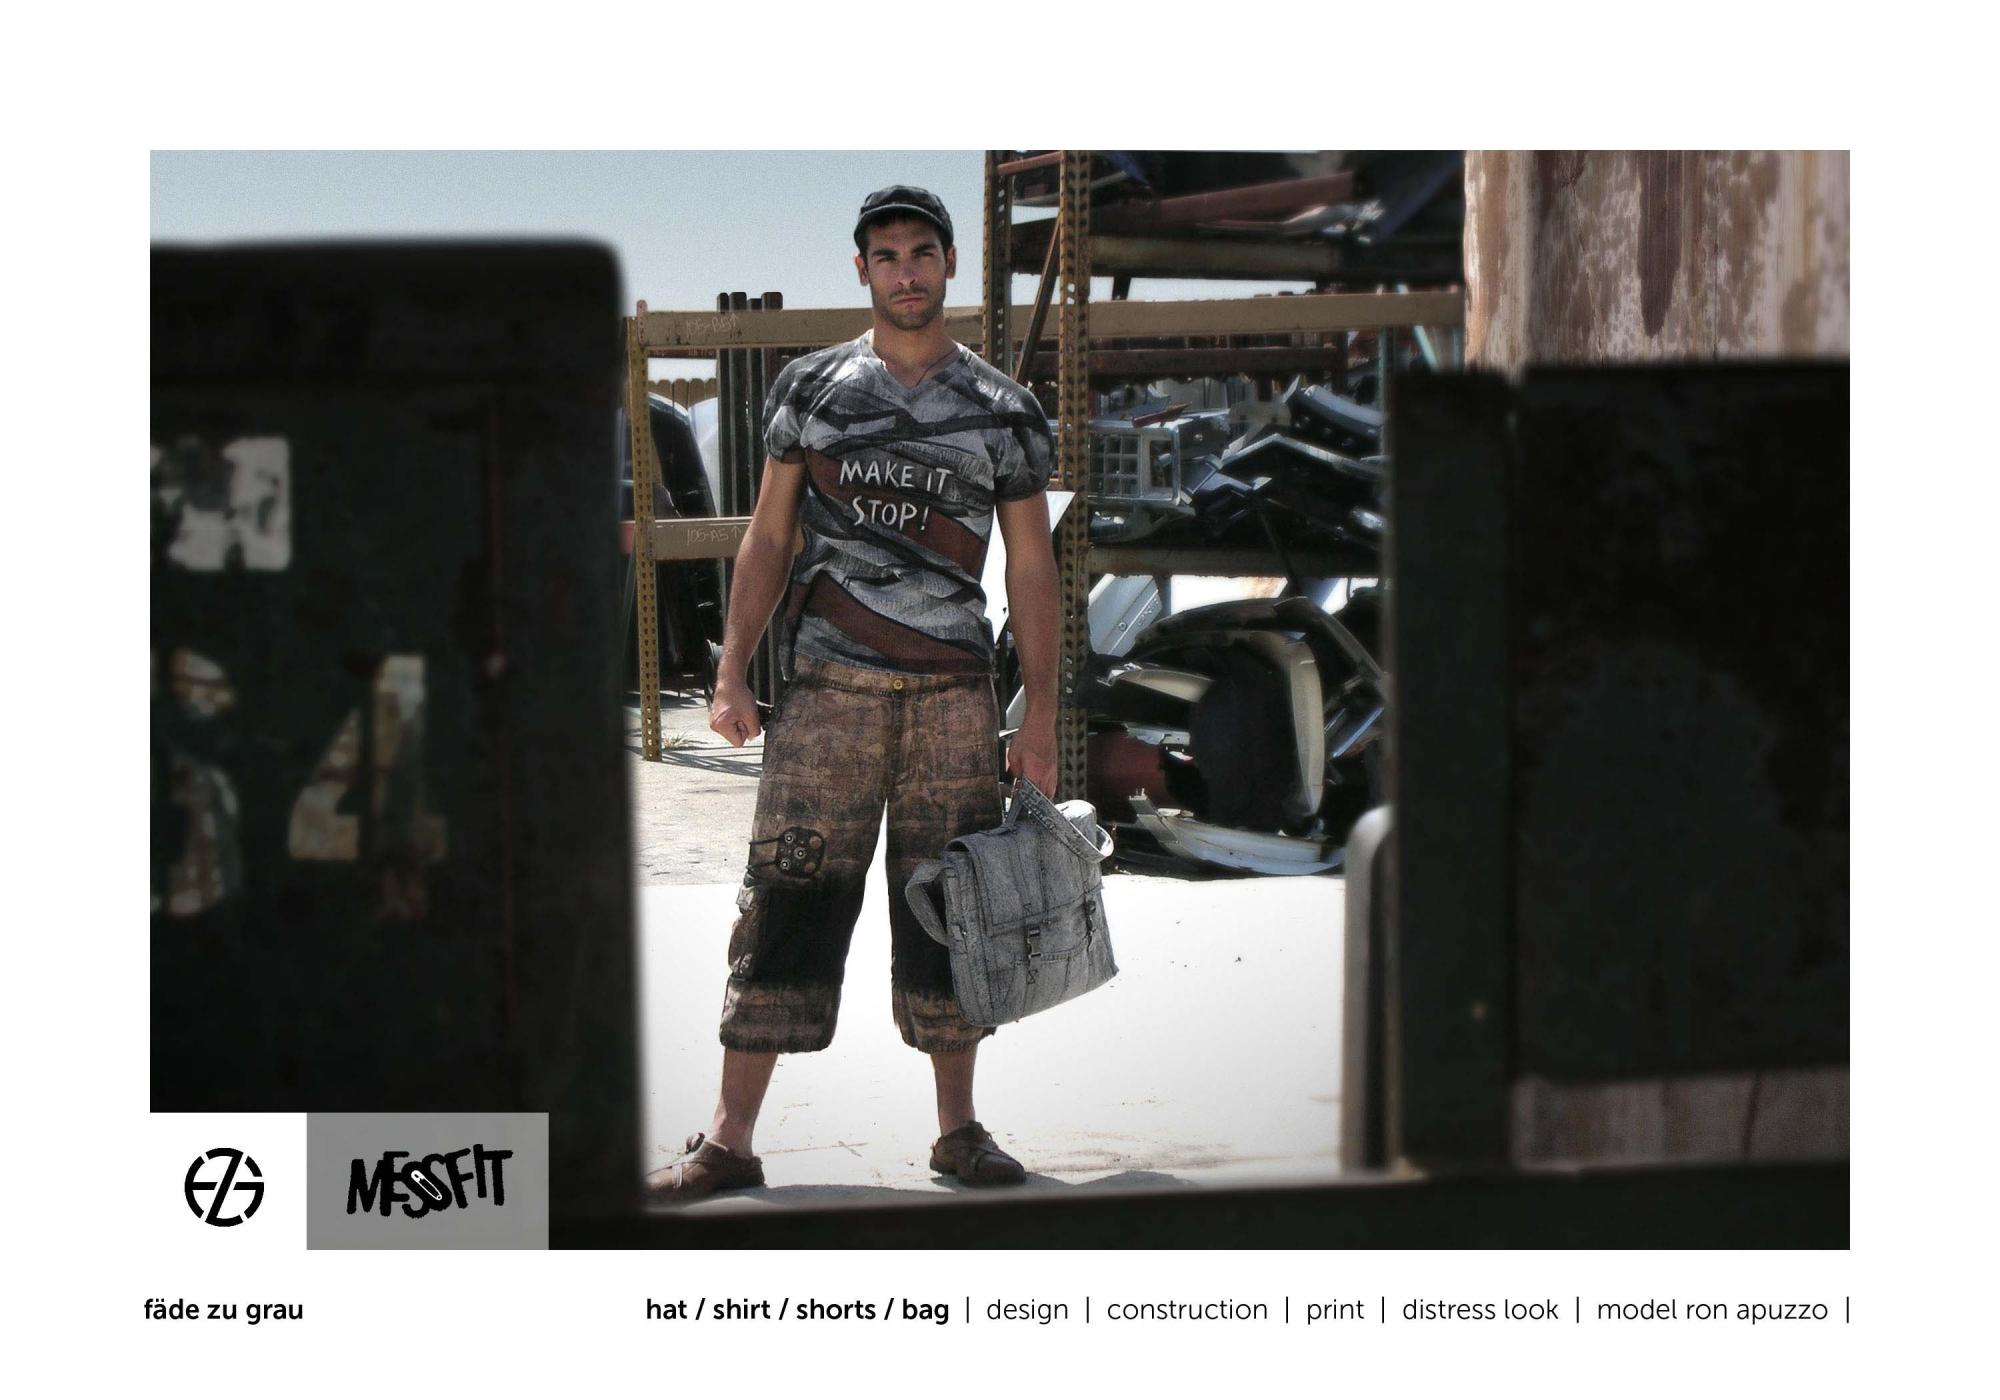 fäde zu grau | photo shoot | shirt, shorts, bag